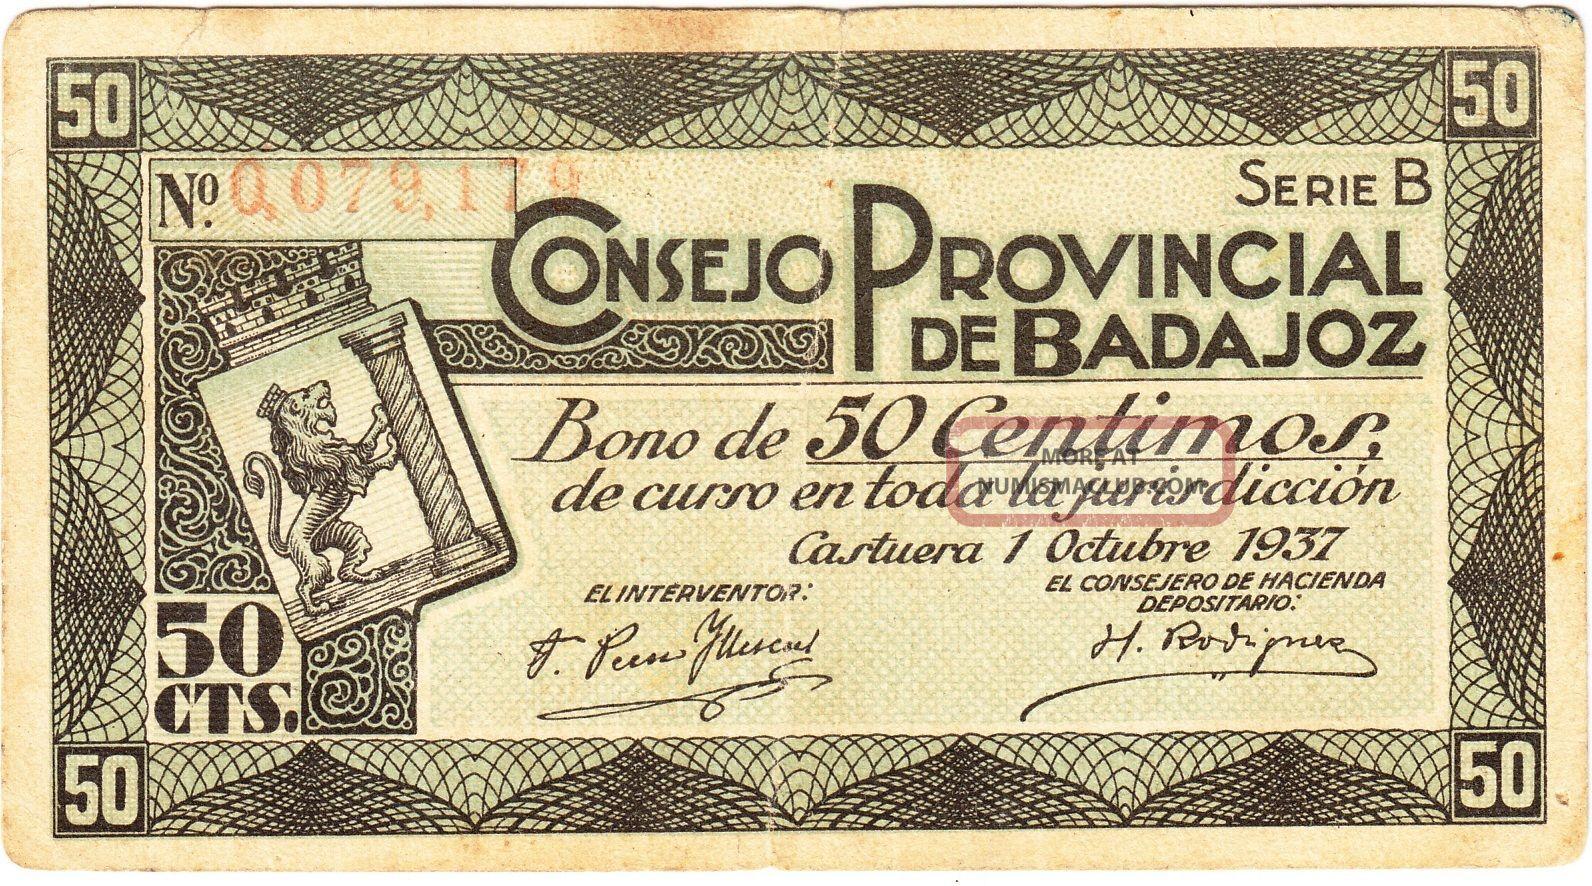 Spain / 50 Cents War Bond,  Provincial Council Of Badajoz,  Castuera 01 Oct 1937 Stocks & Bonds, Scripophily photo